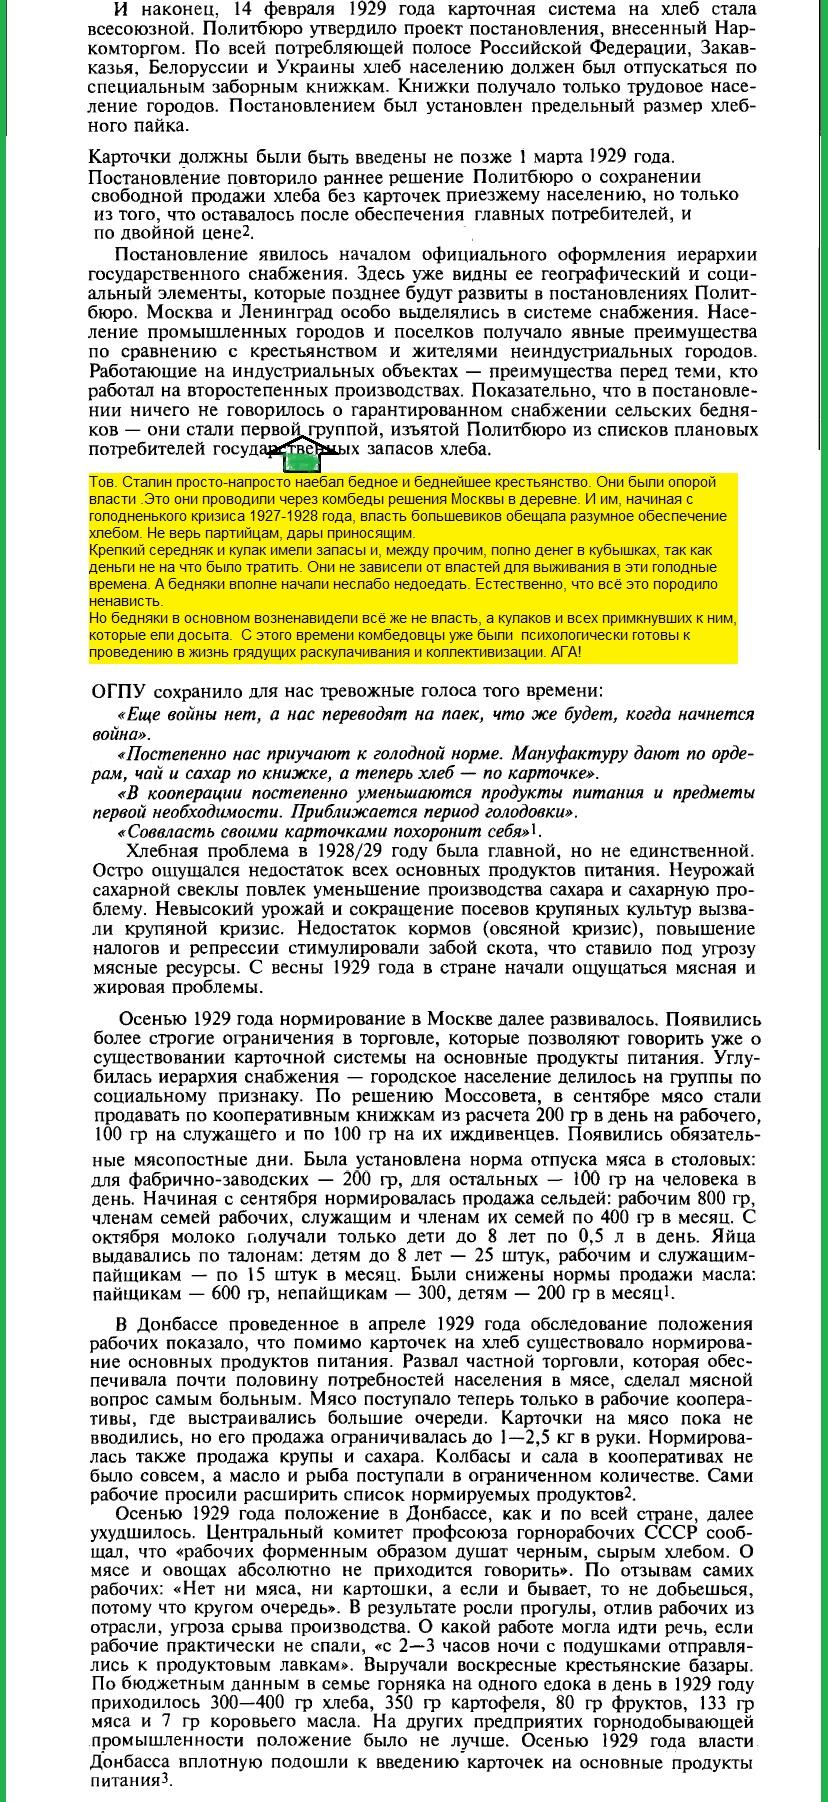 Е. Осокина. За фасадом сталинского изобилия (1)